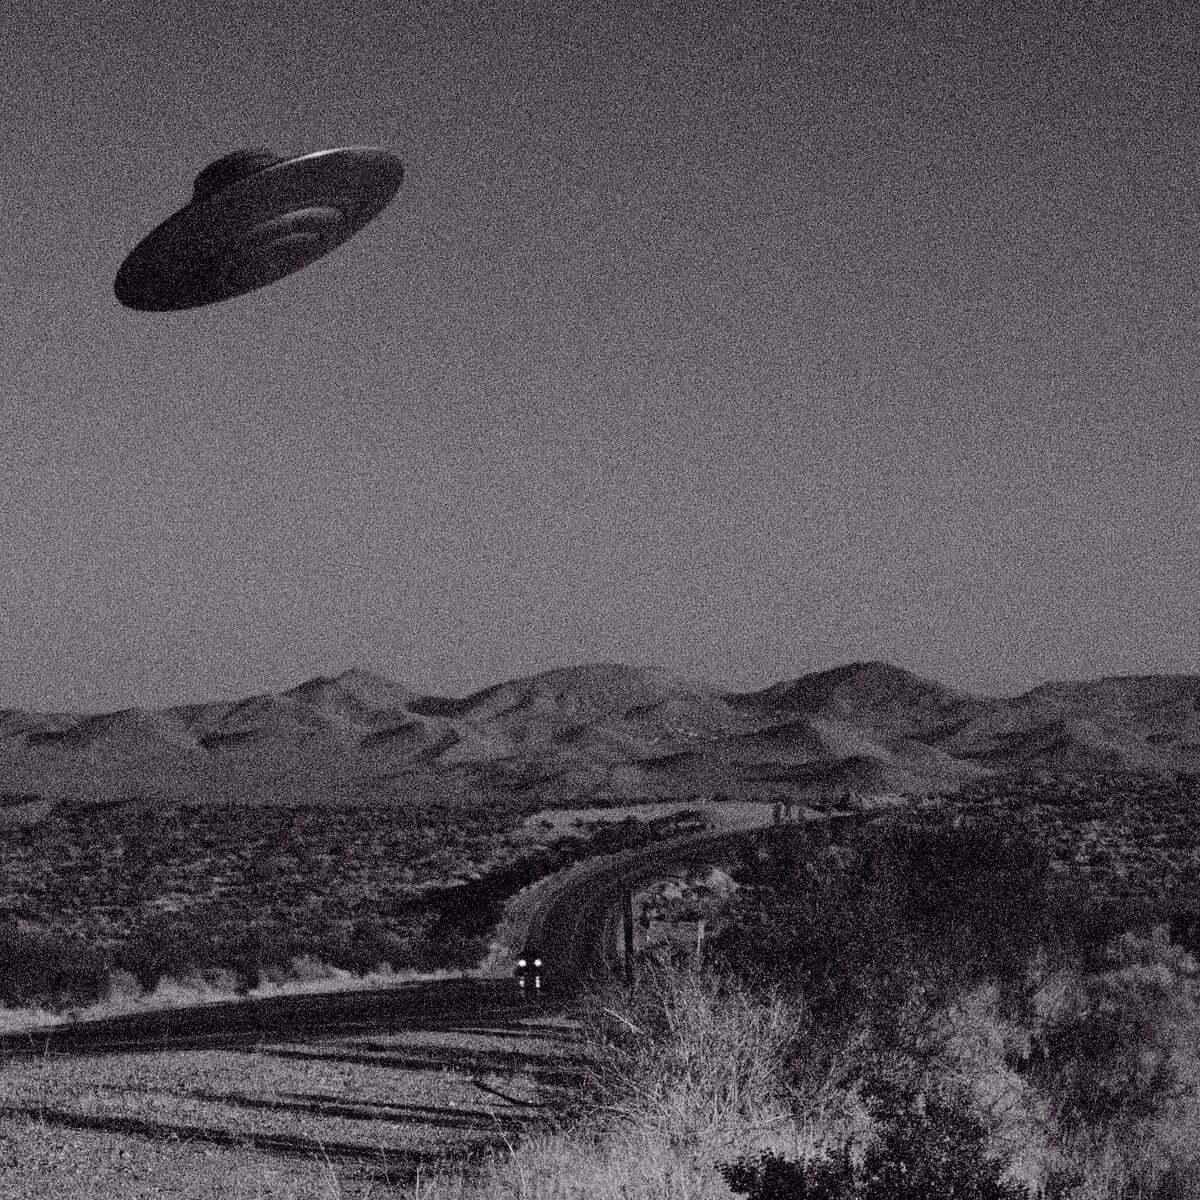 A UFO zips through the sky.